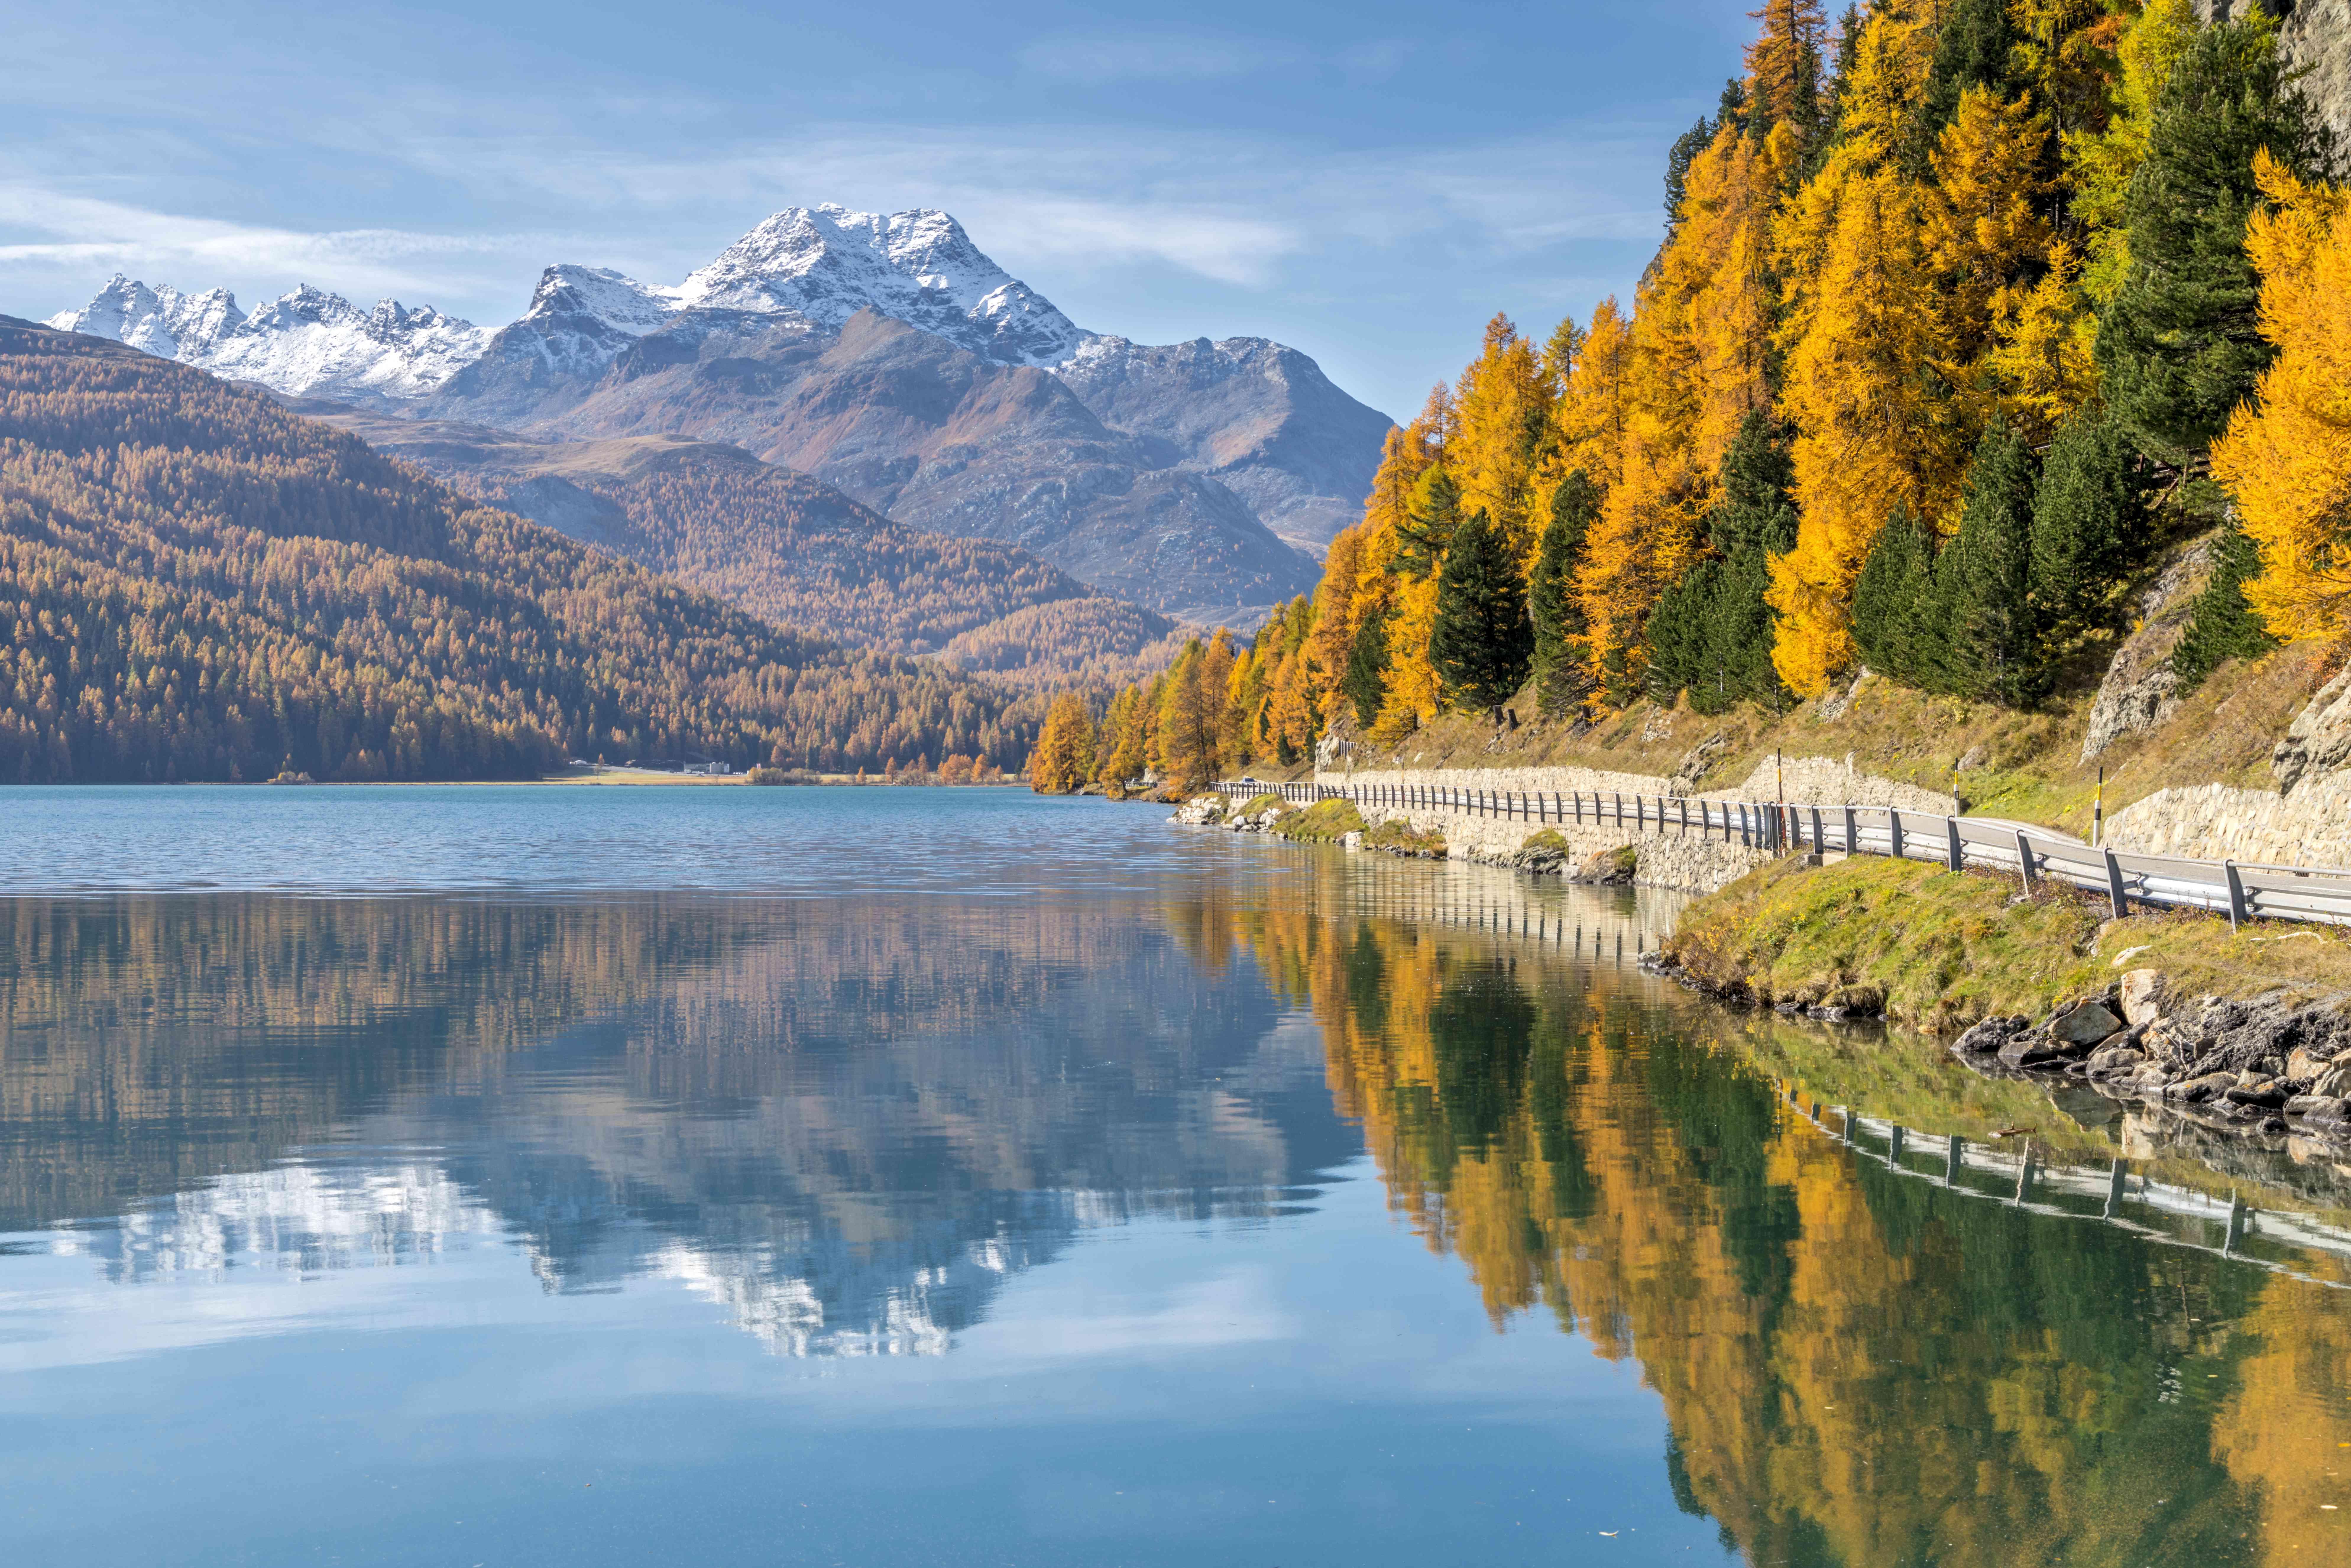 Larch trees mirrored in Lake Silvaplana in autumn, St. Moritz, Switzerland